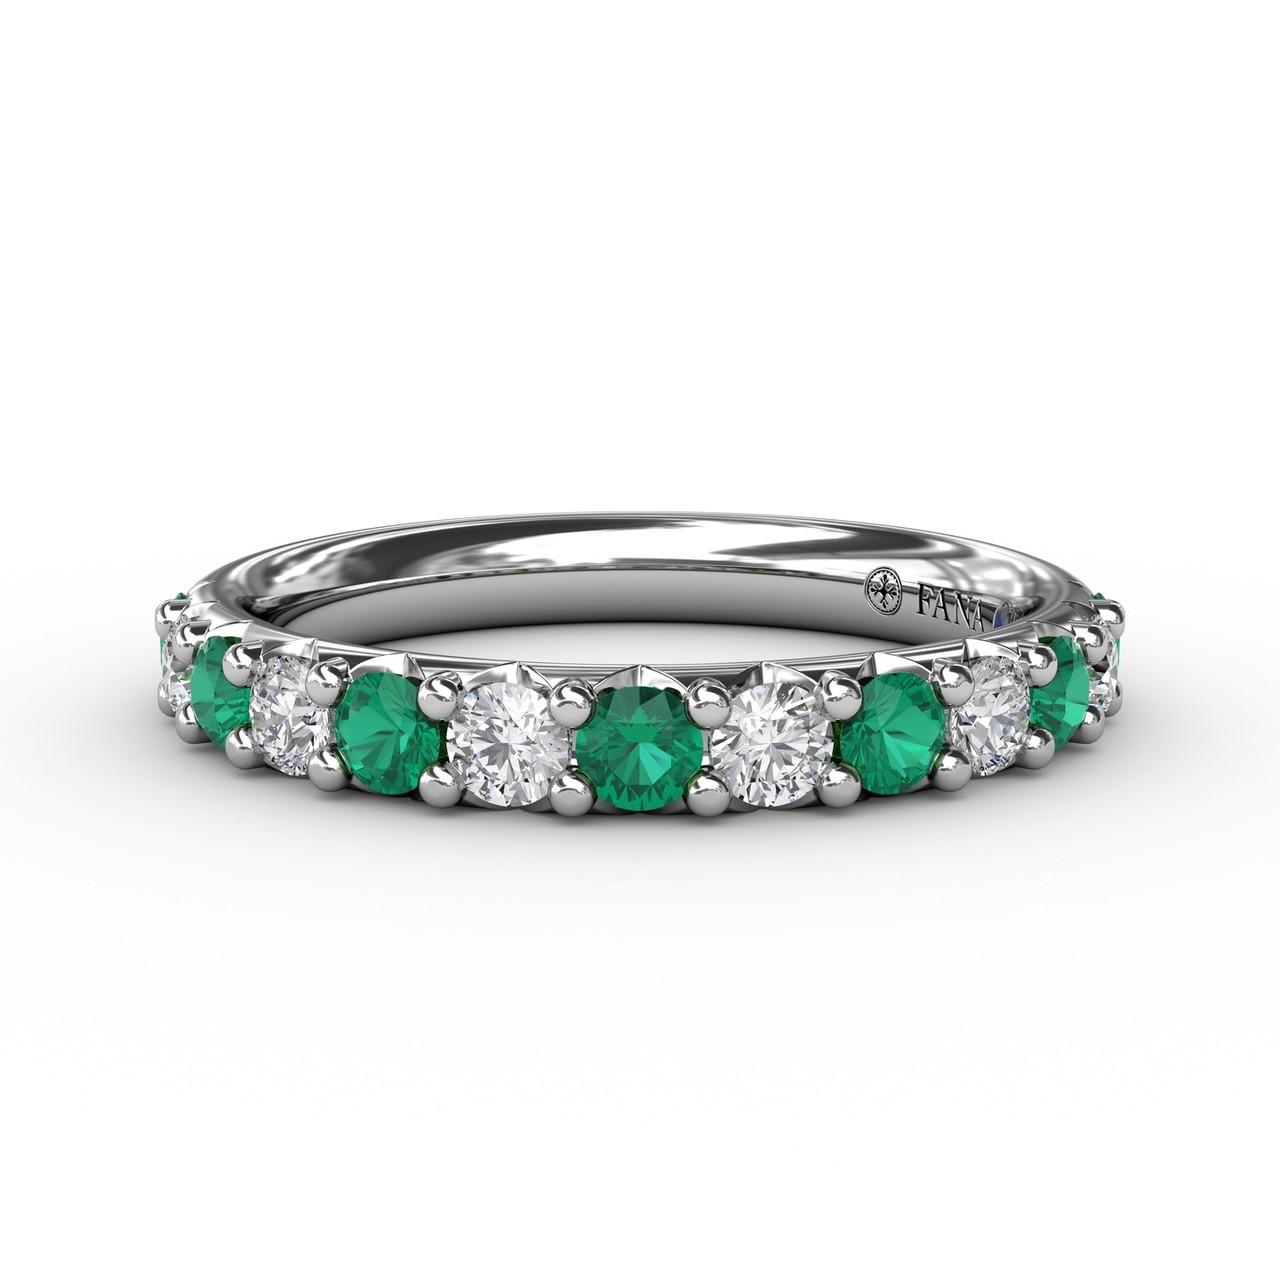 Emerald and Diamond Shared Prong Anniversary Band